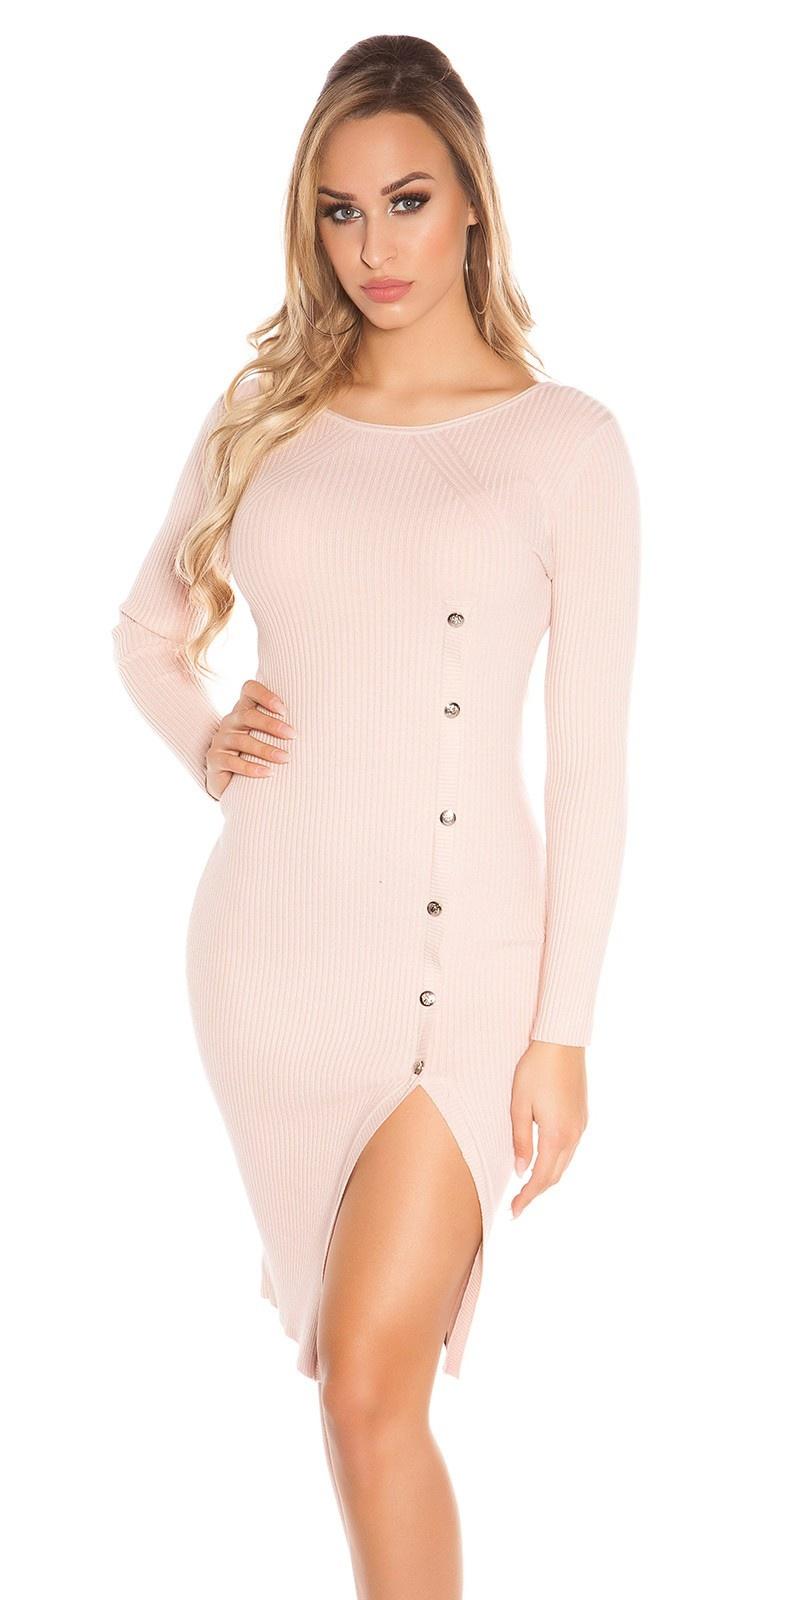 Sexy KouCla Ripp Knit dress w. deco buttons Antiquepink